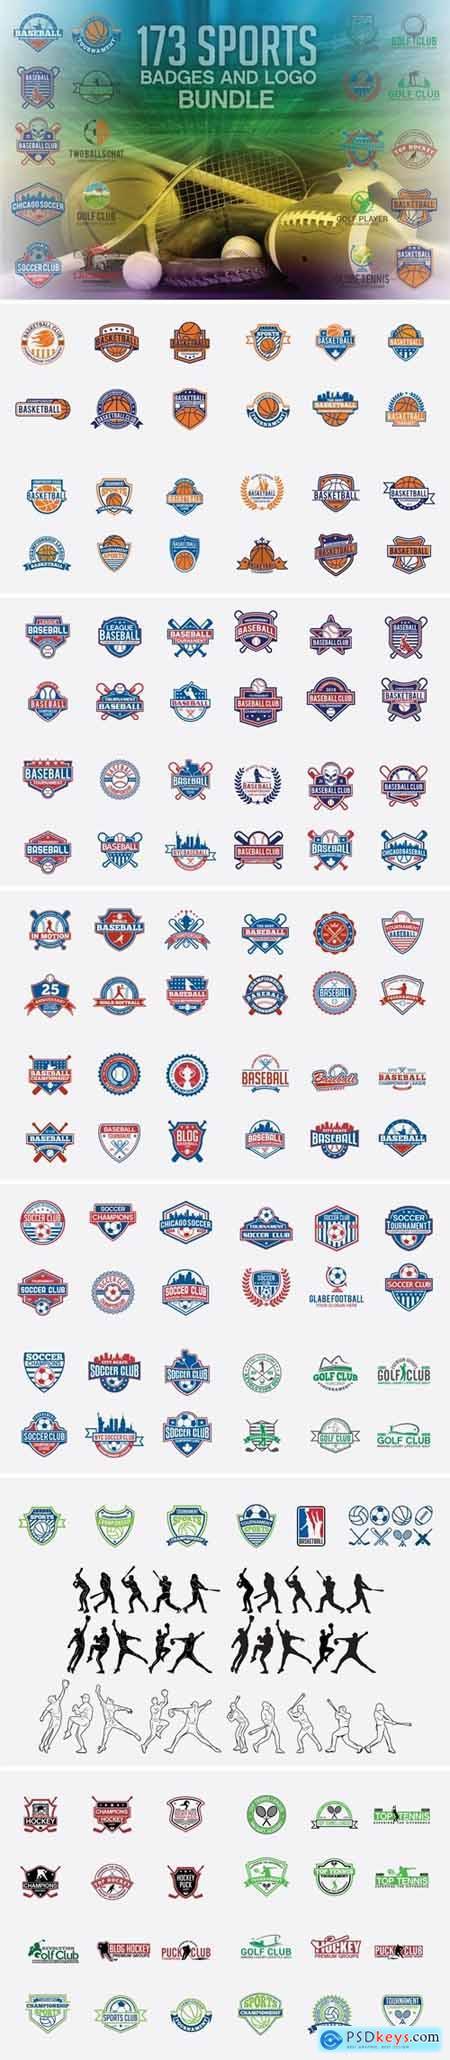 173 Sports Badges and Logo Bundle